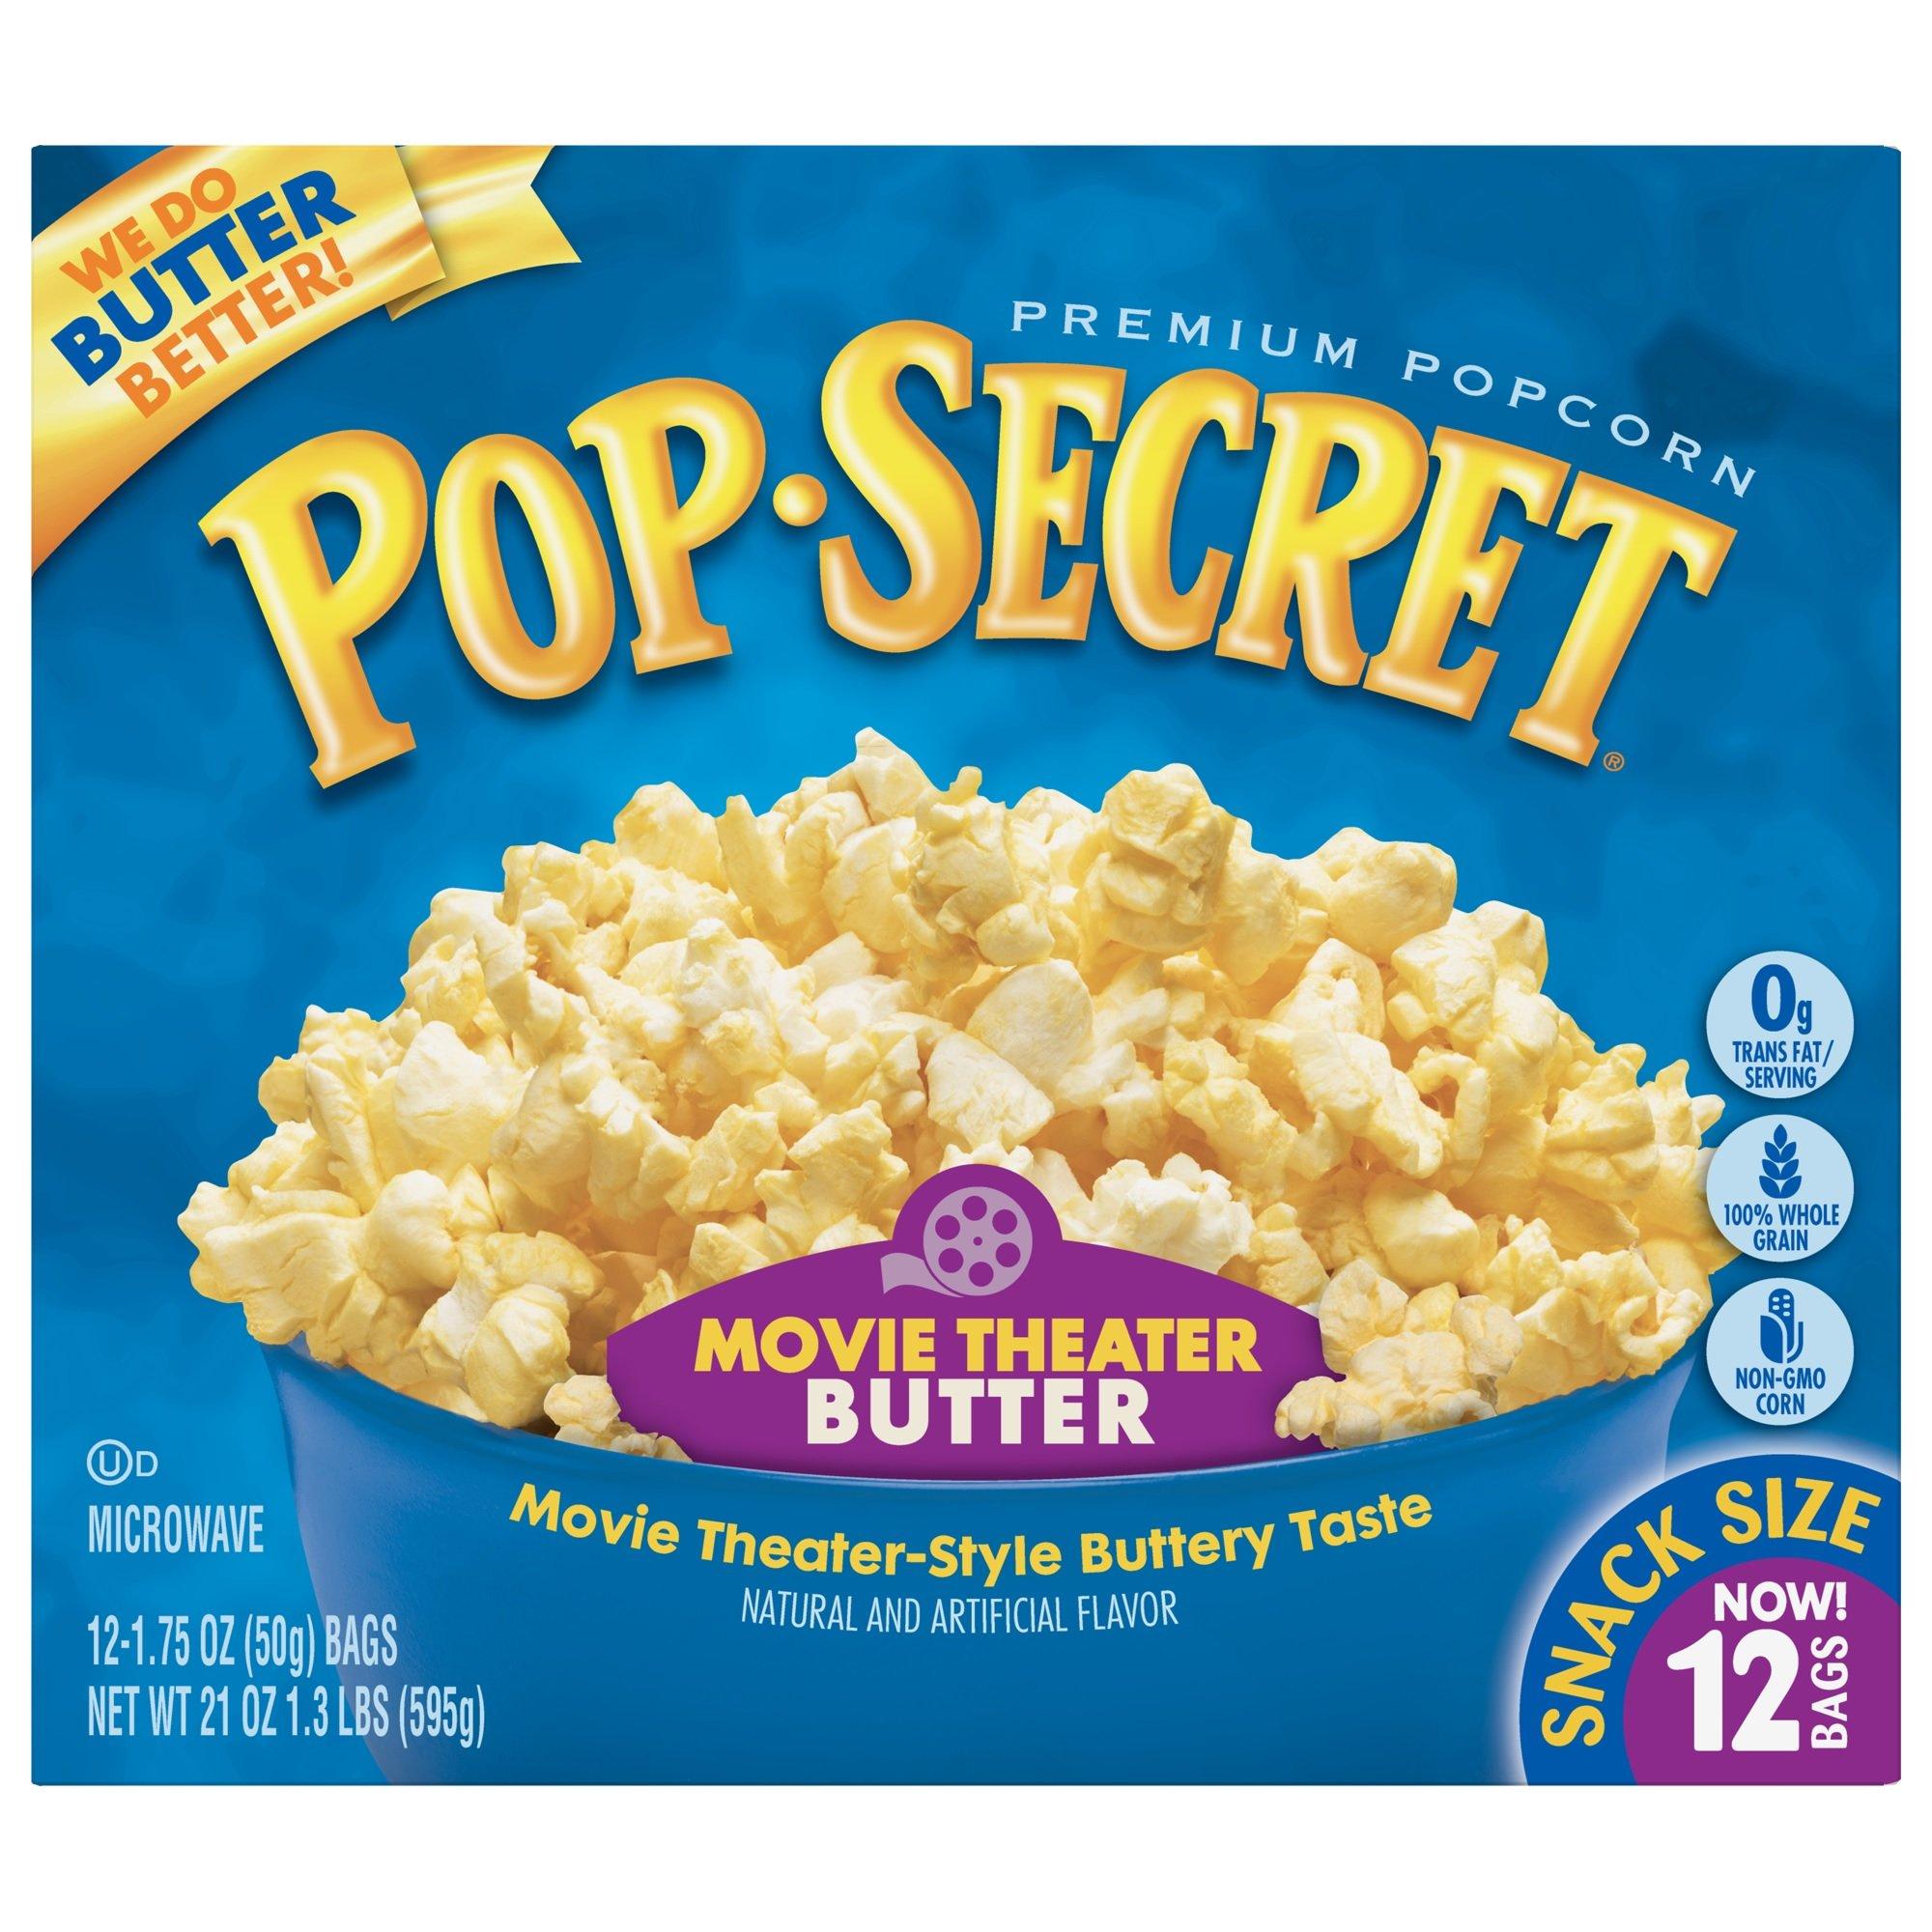 Pop Secret Popcorn, Snack Size Movie Theater Butter,12 Count, 12 Ct